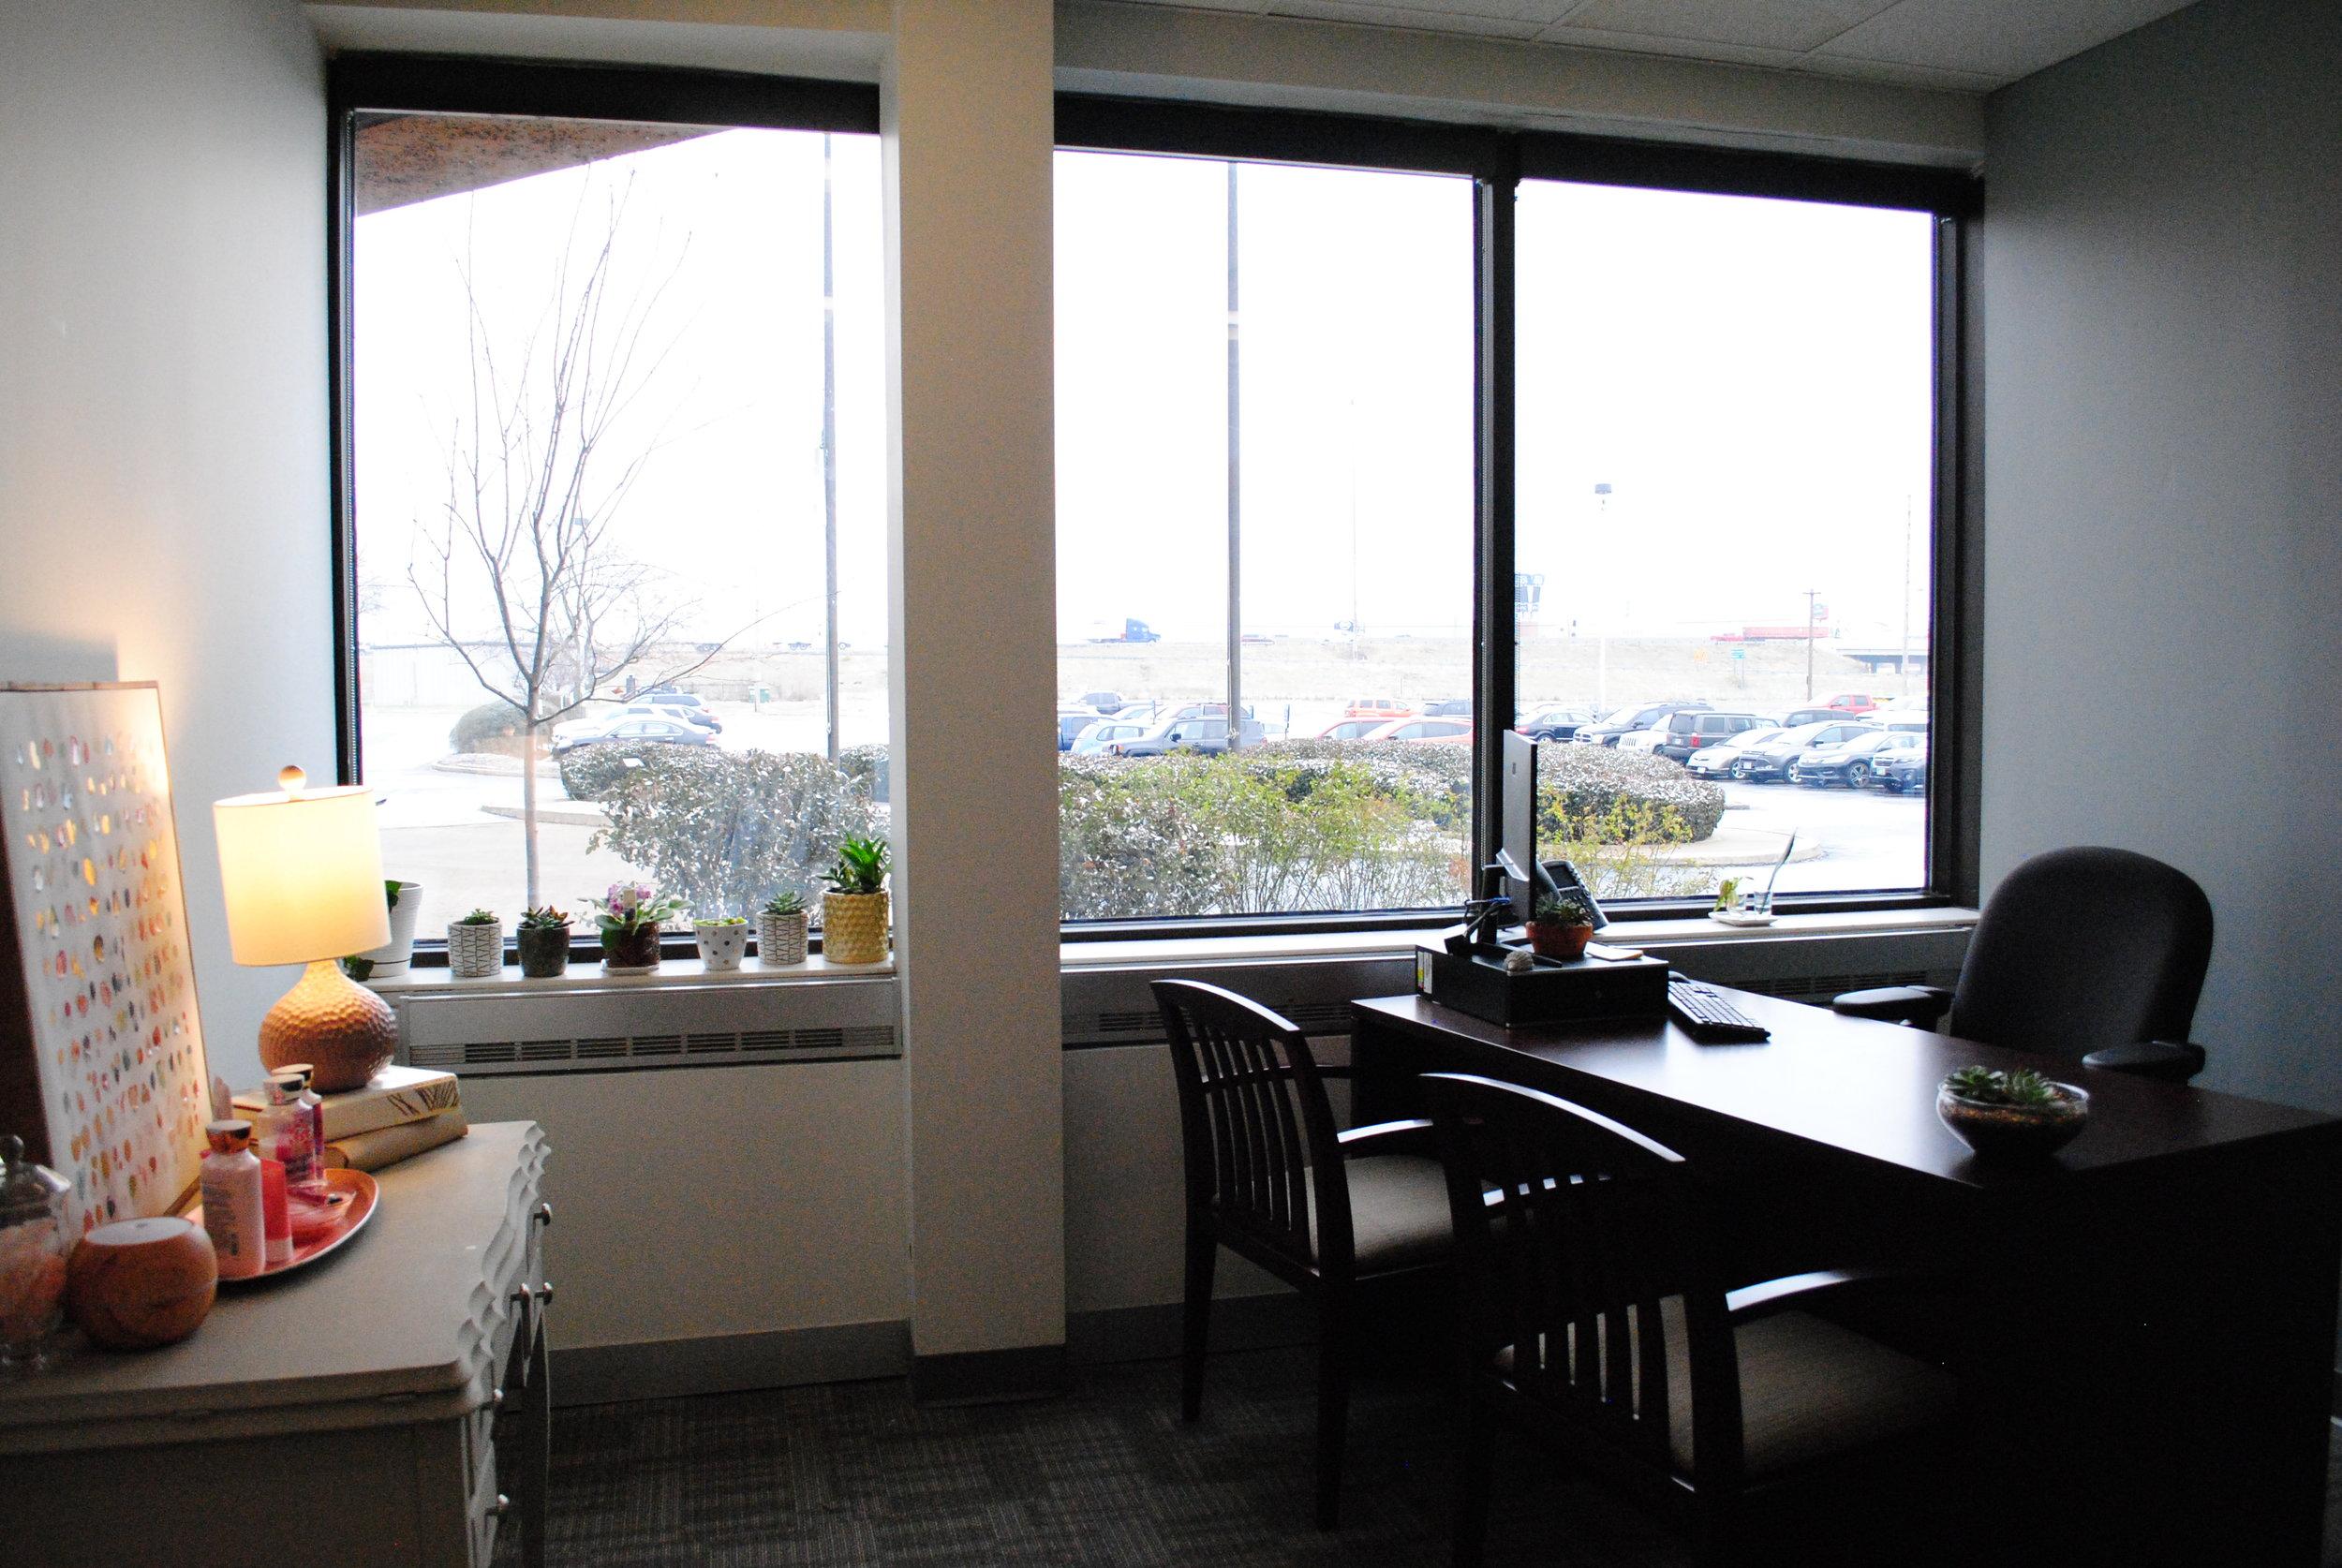 Counselor's Office - Dayton